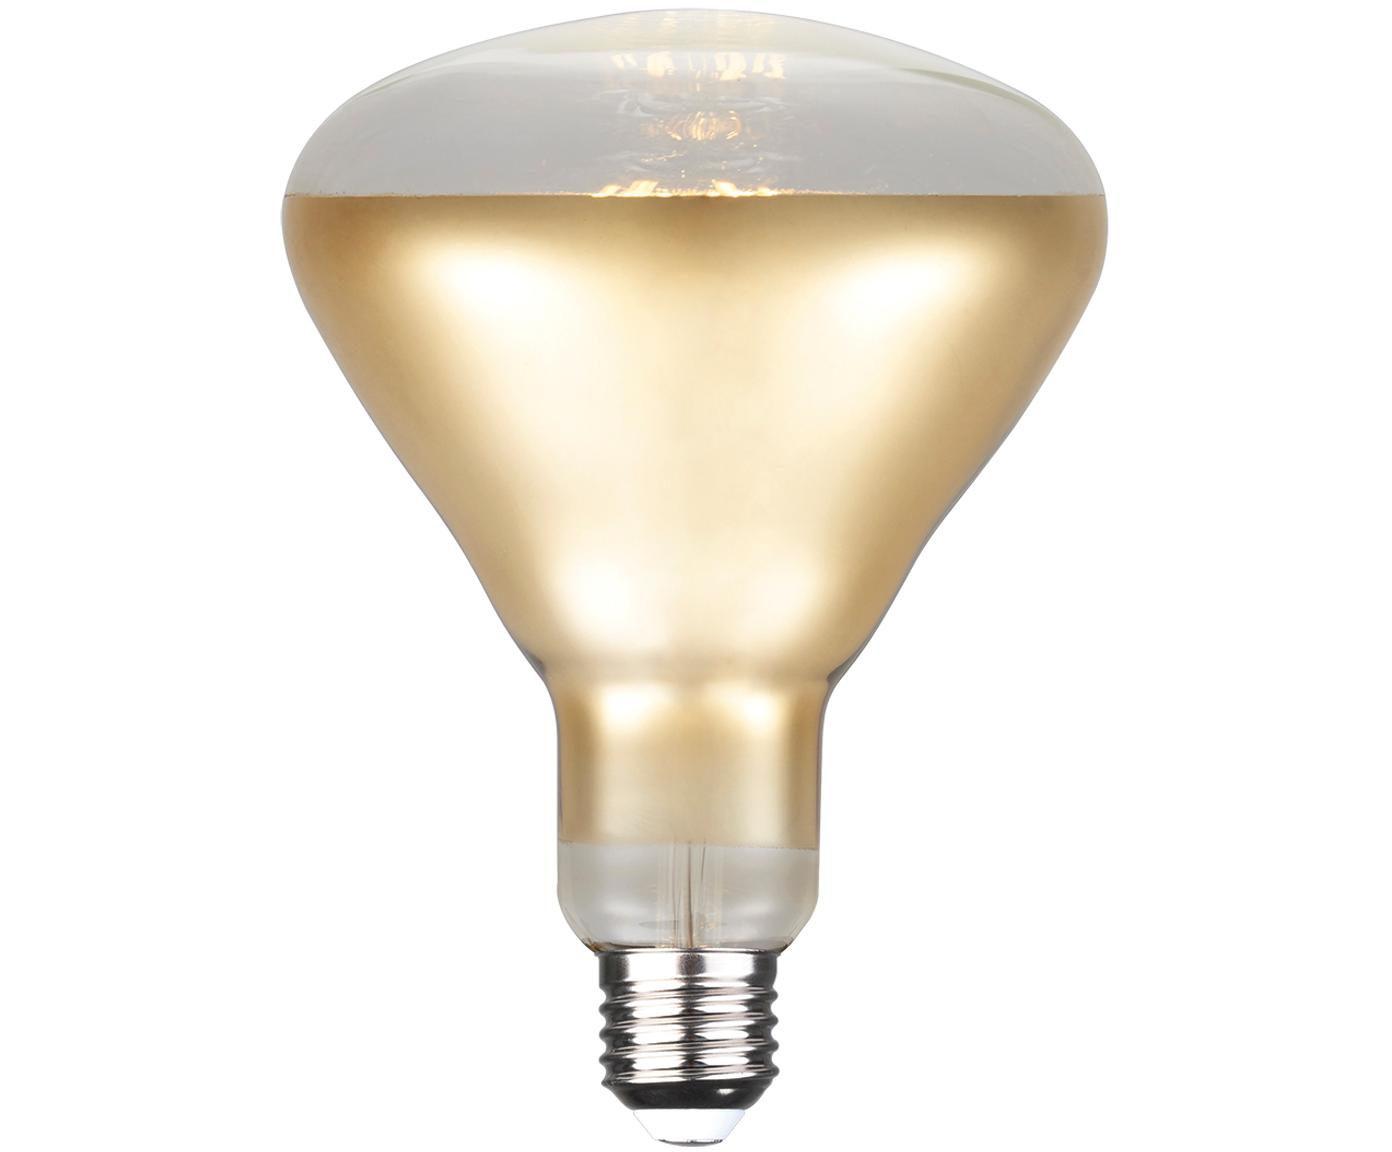 Dimbare LED lamp reflector (E27 / 7W), Lampenkap: glas, Fitting: aluminium, Goudkleurig, Ø 13 x H 17 cm